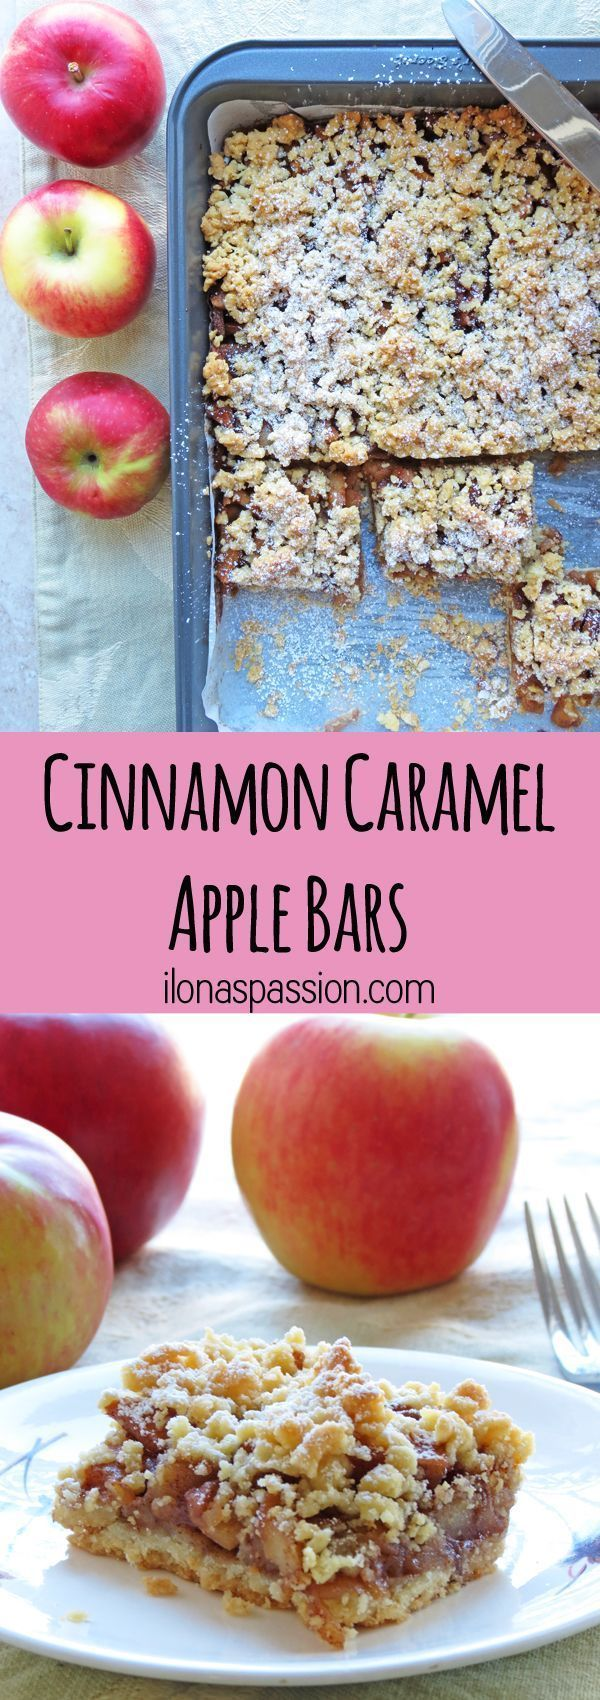 Crunchy Cinnamon Caramel Apple Bars by http://ilonaspassion.com